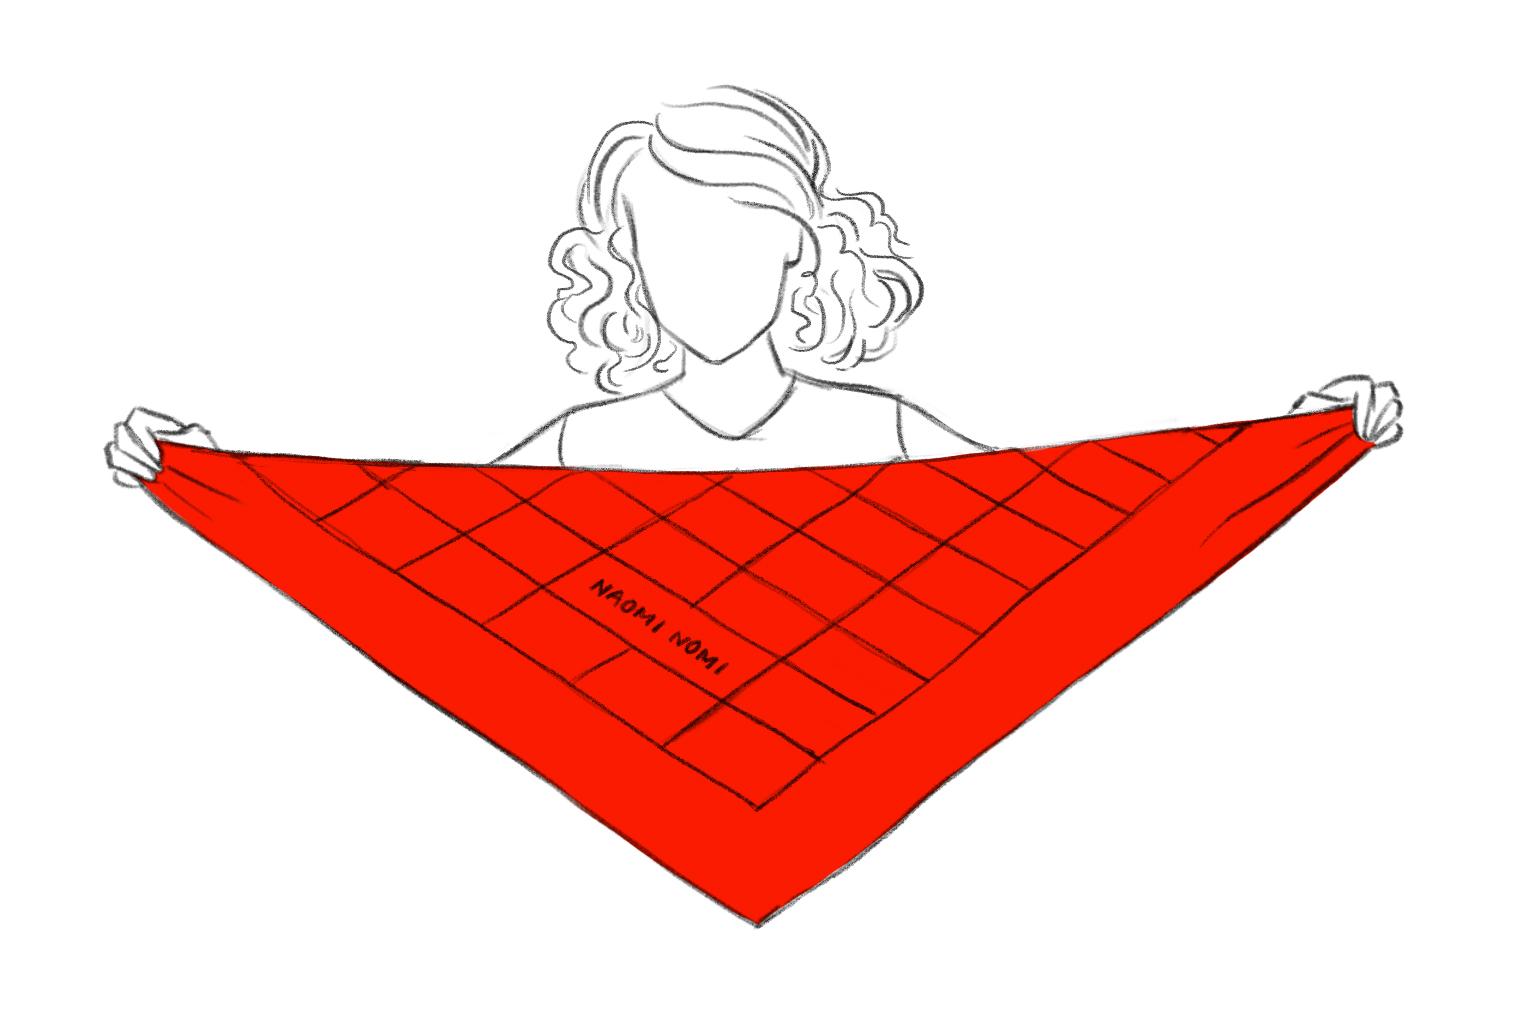 Girlscout2_Web.jpg